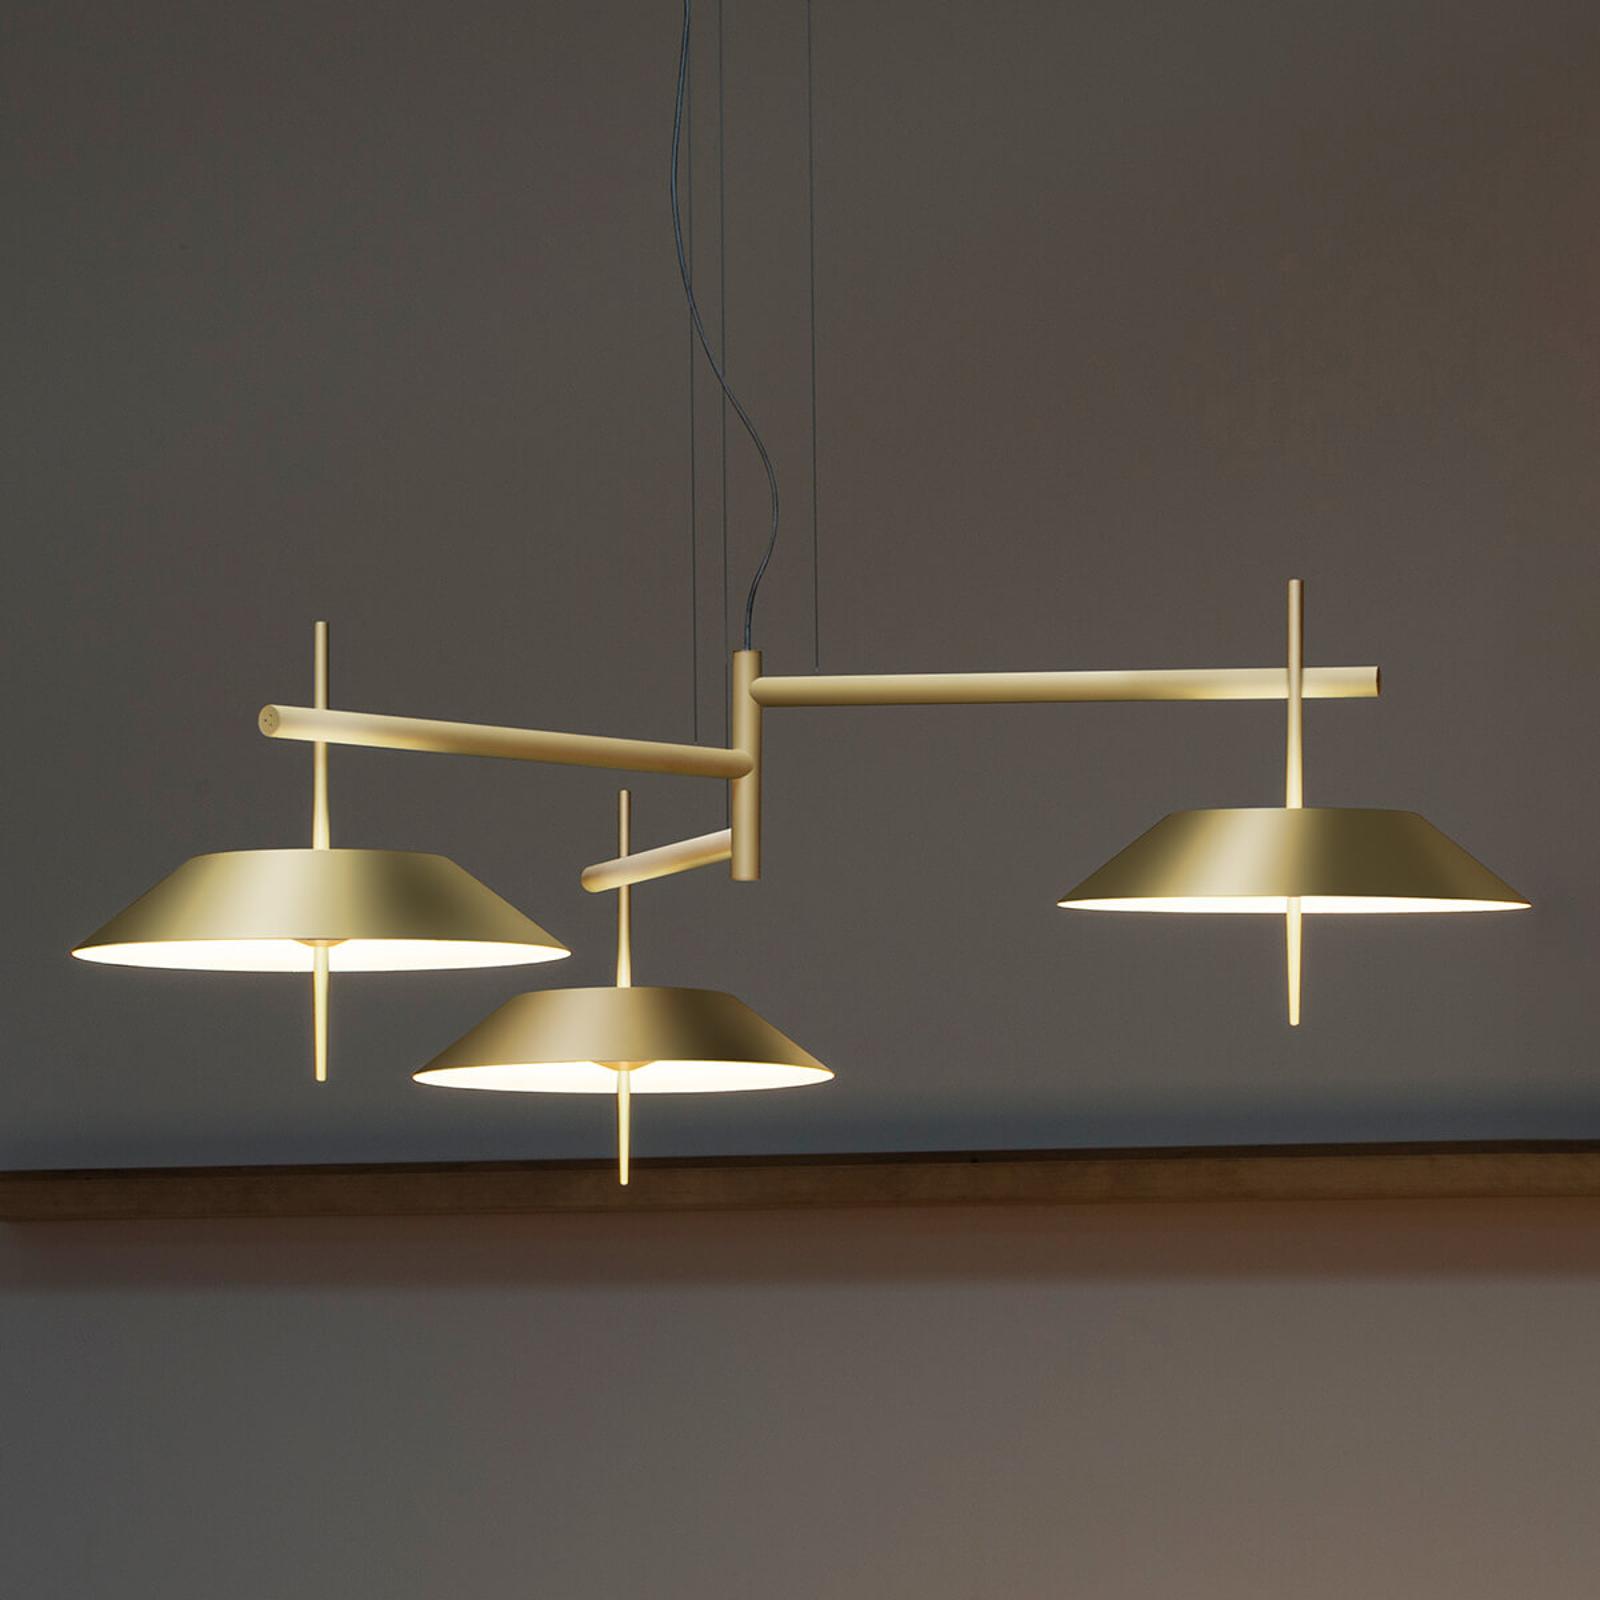 Acquista Lampada LED Mayfair dorata, 3 punti luce